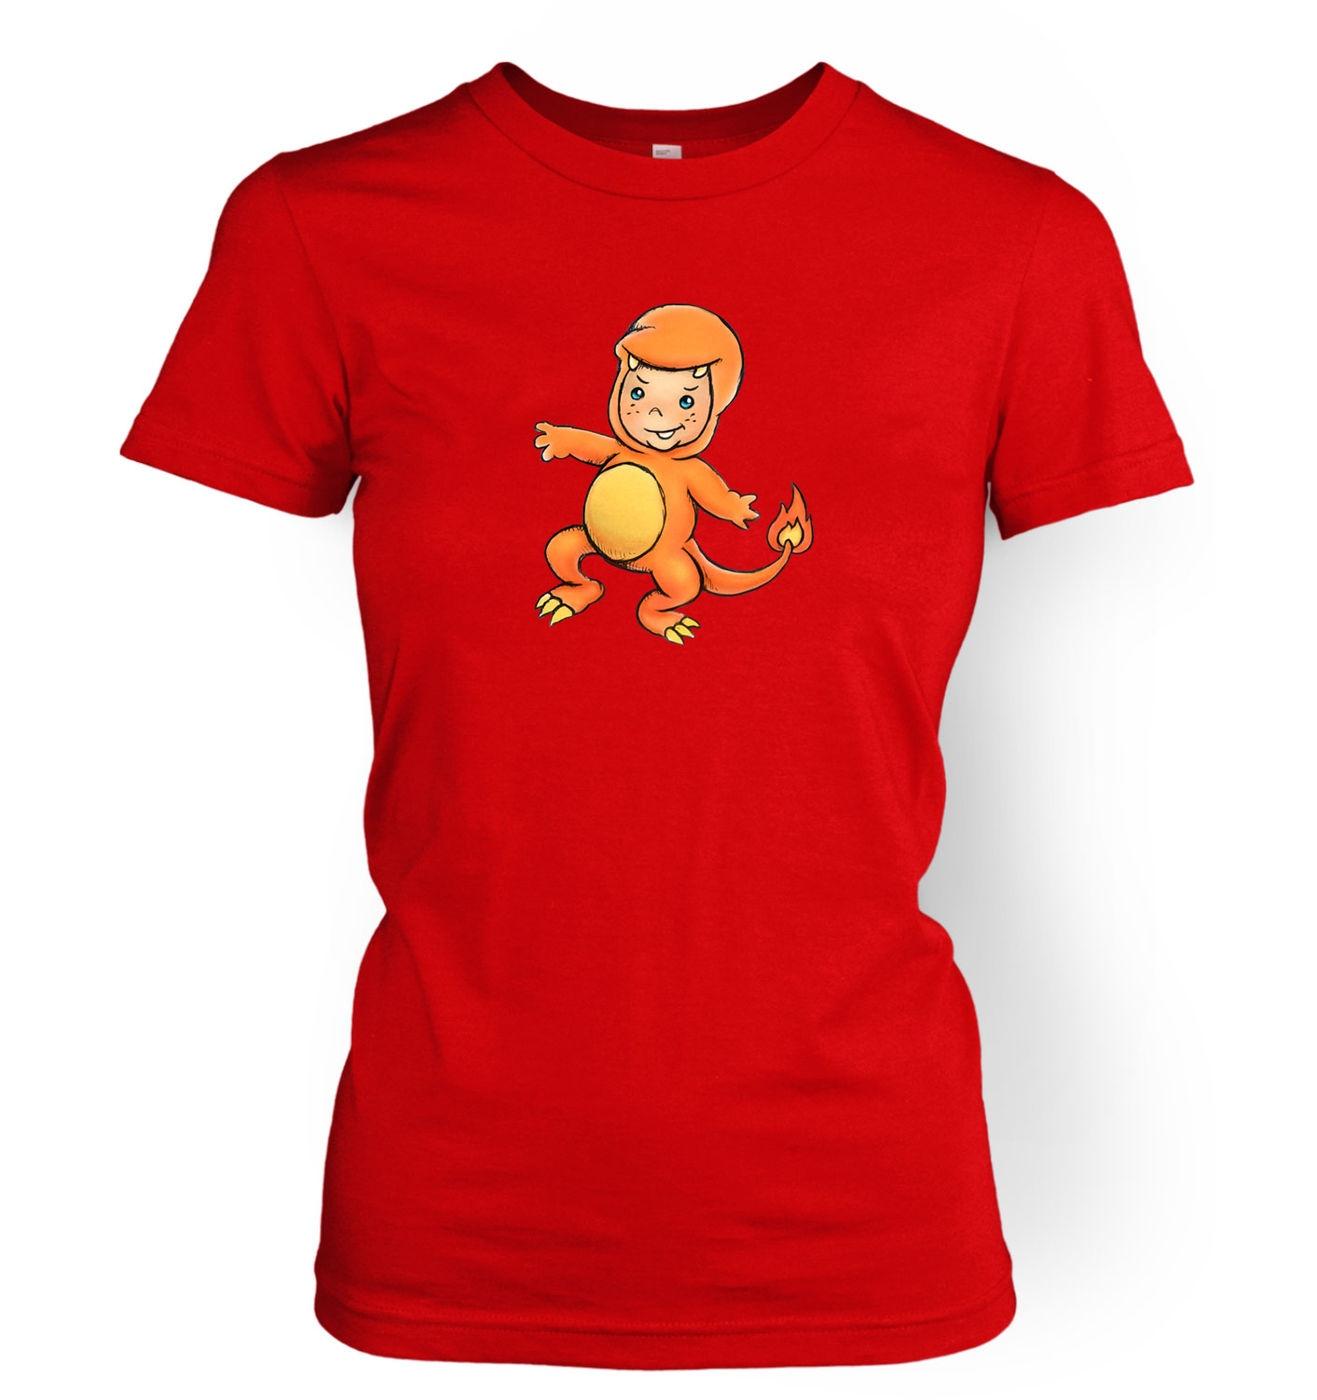 37373f2e Baby Charmander women's t-shirt - Somethinggeeky